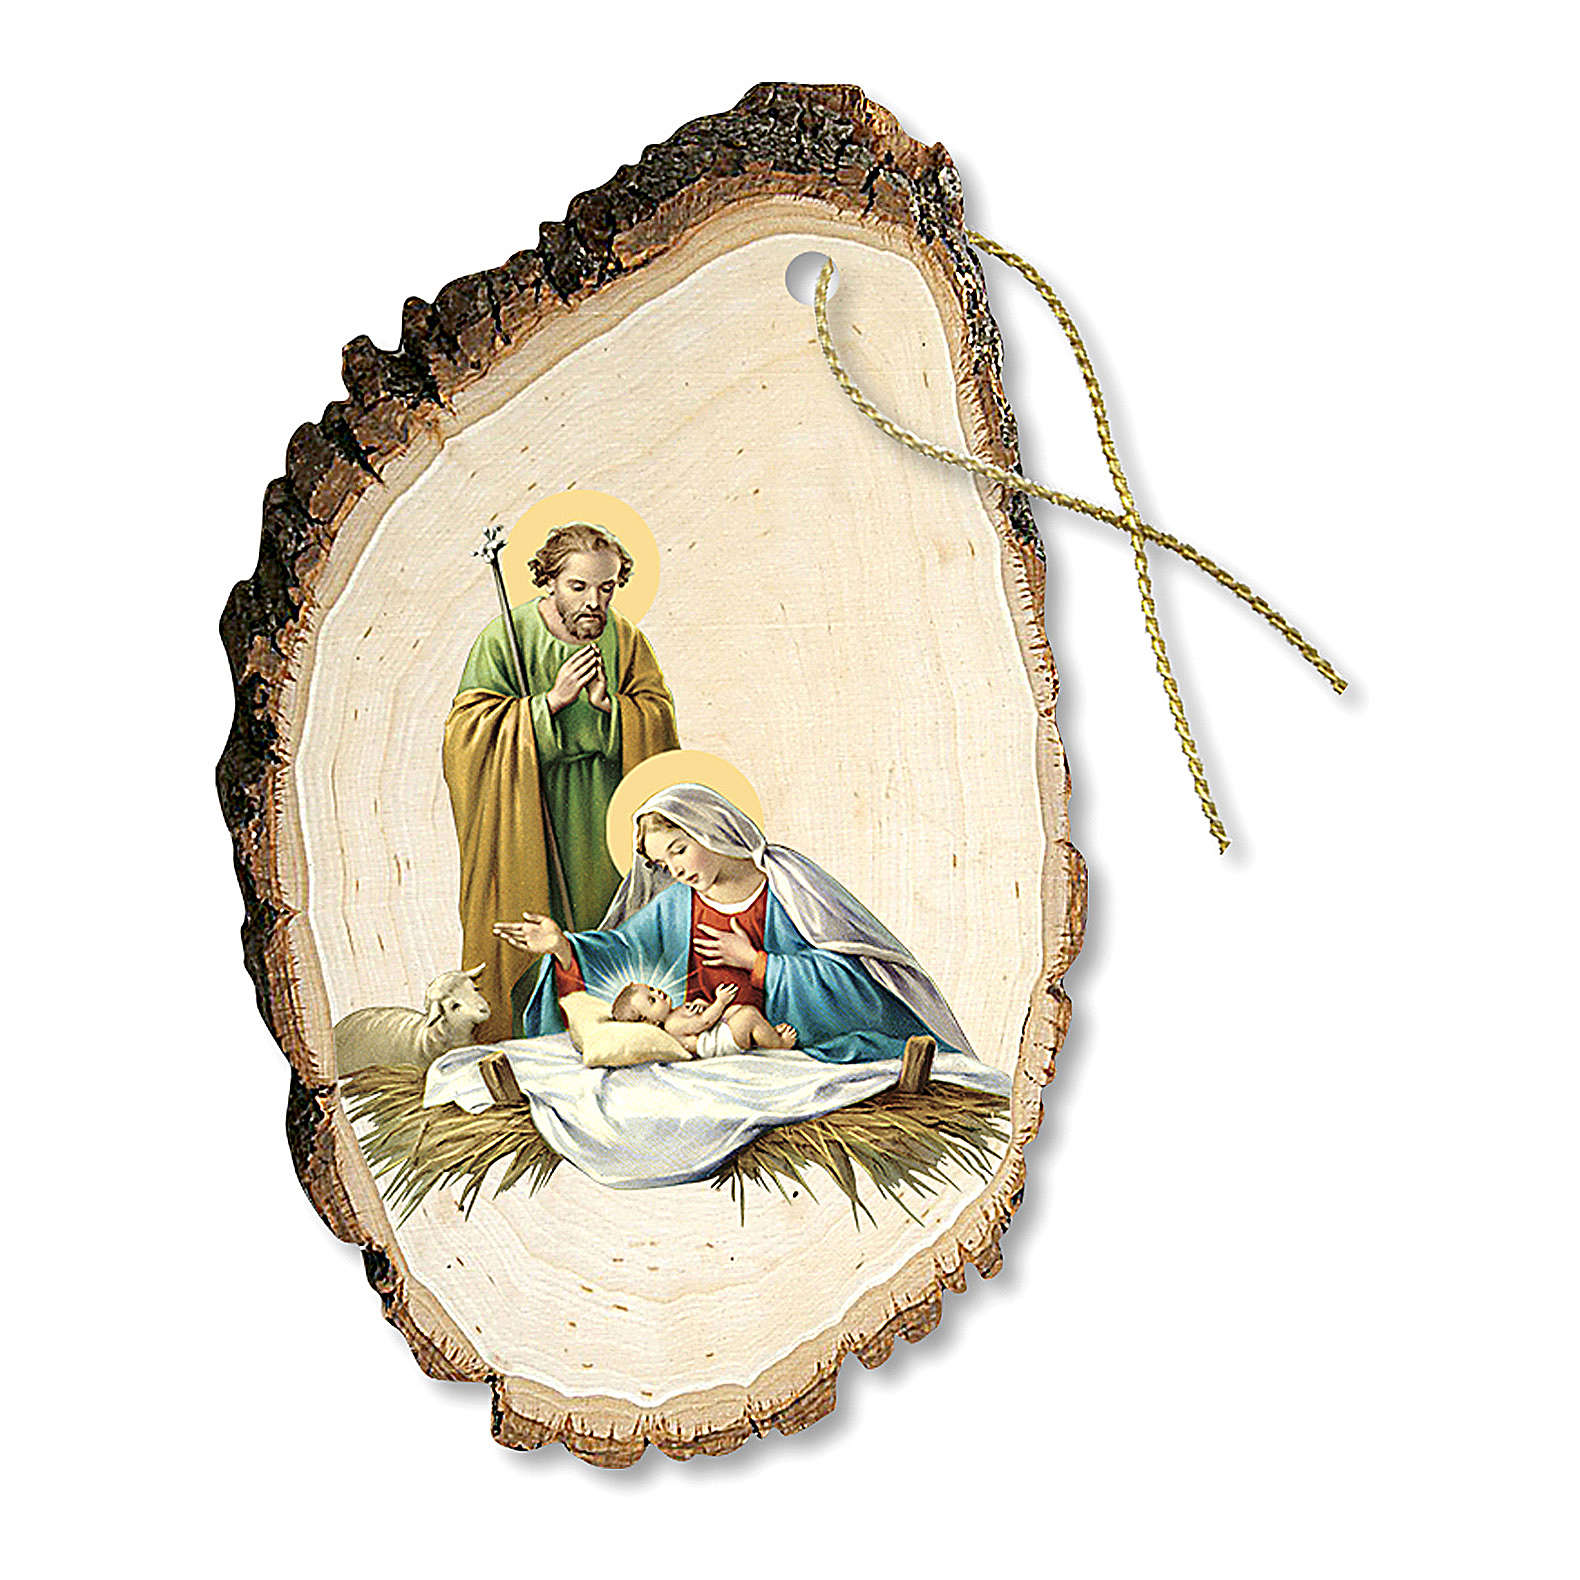 Decoración Navideña madera moldeada Sagrada Familia Niño Jesús 4